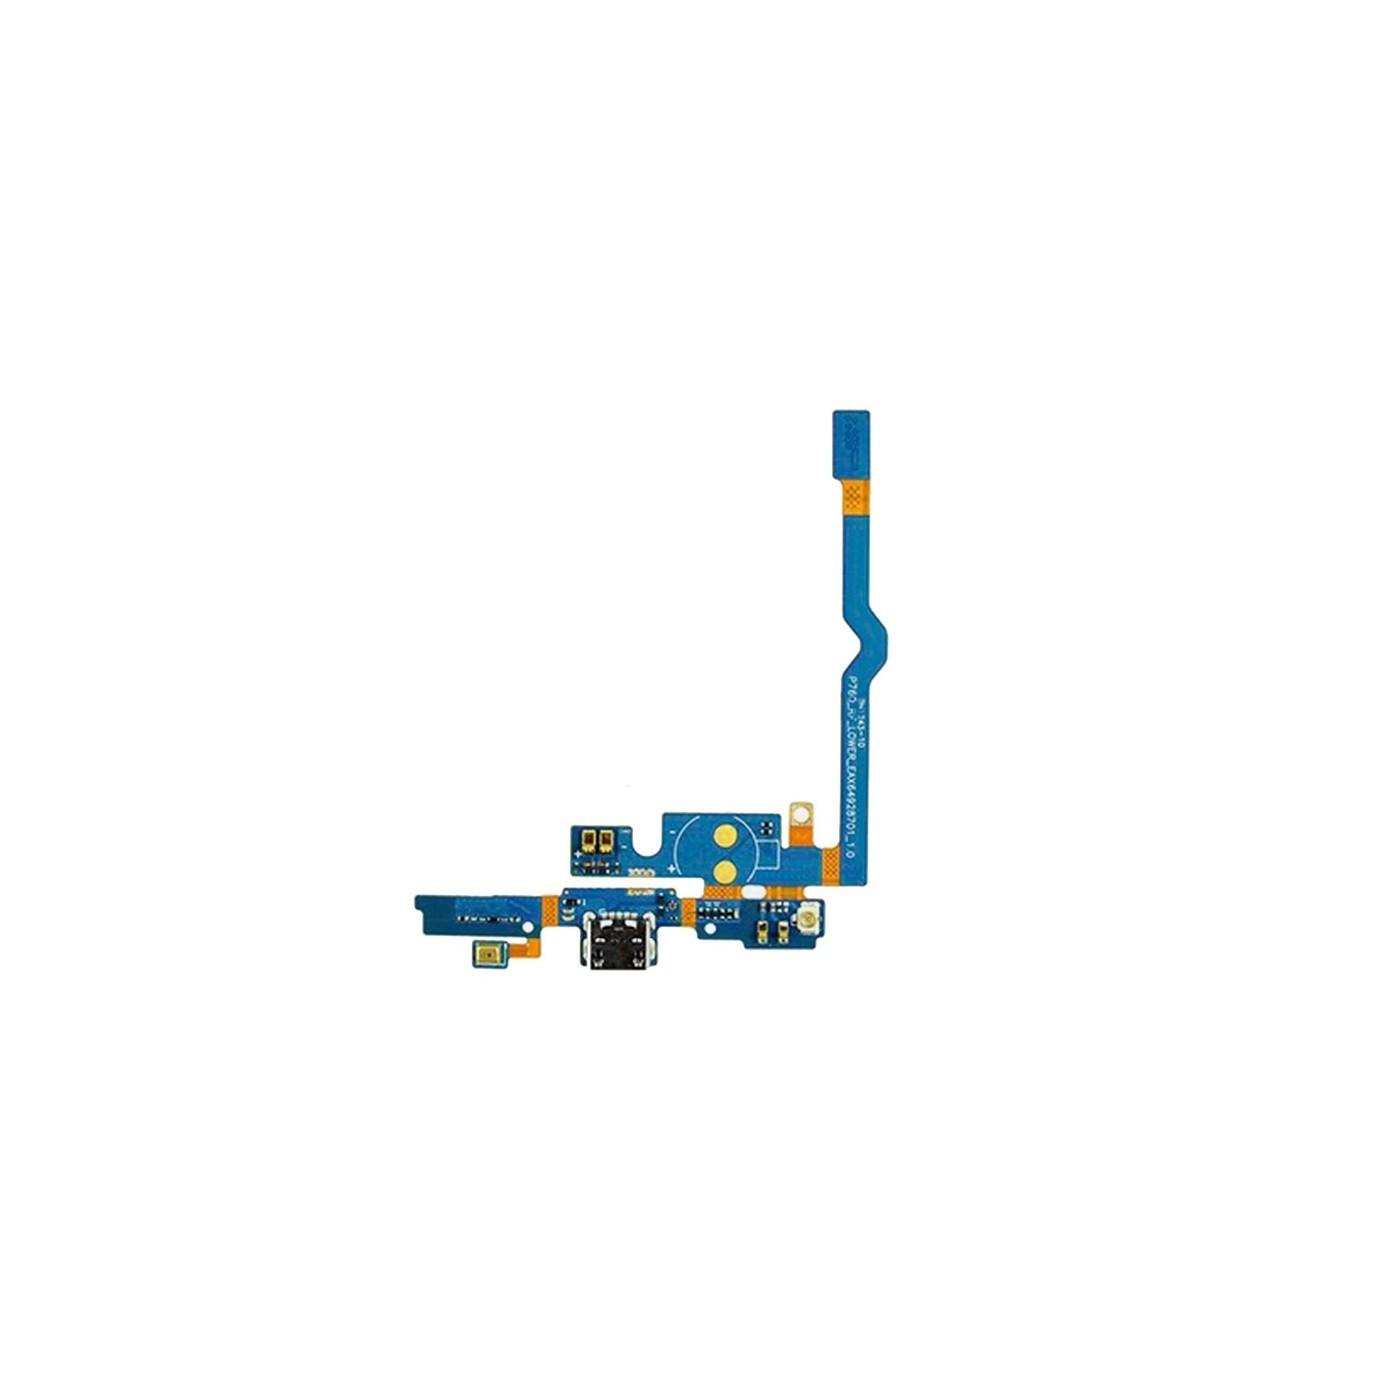 Flat Flex Ladeanschluss für LG P760 - Optimus L9 Ladedock